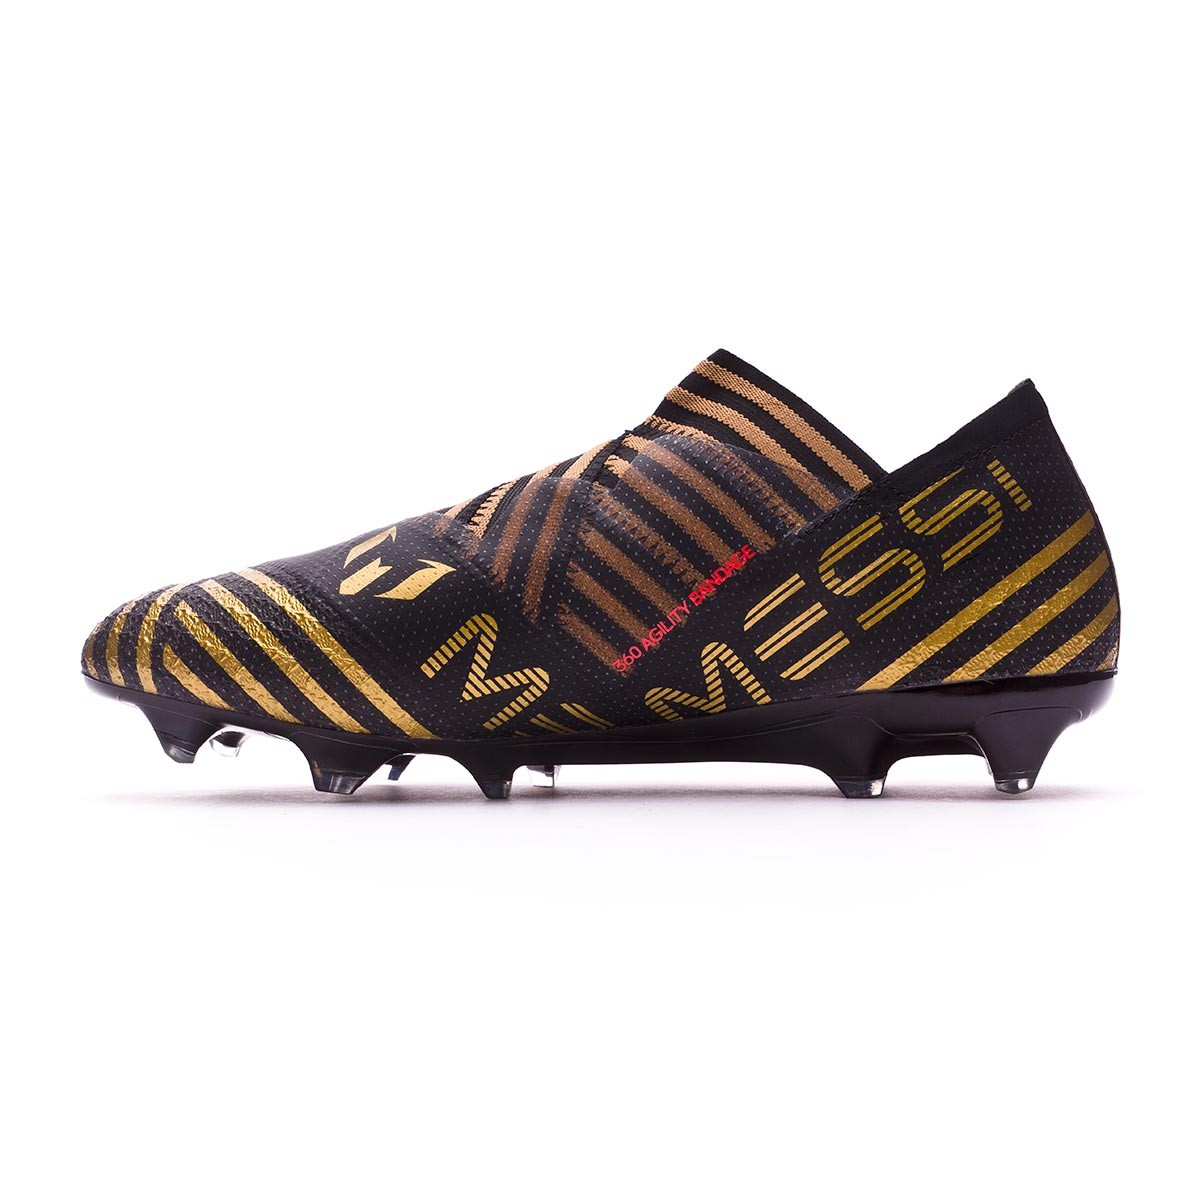 ca1ff4d0ffab Football Boots adidas Nemeziz Messi 17+ 360 Agility FG Core black-Solar  red-Tactile gold metallic - Football store Fútbol Emotion